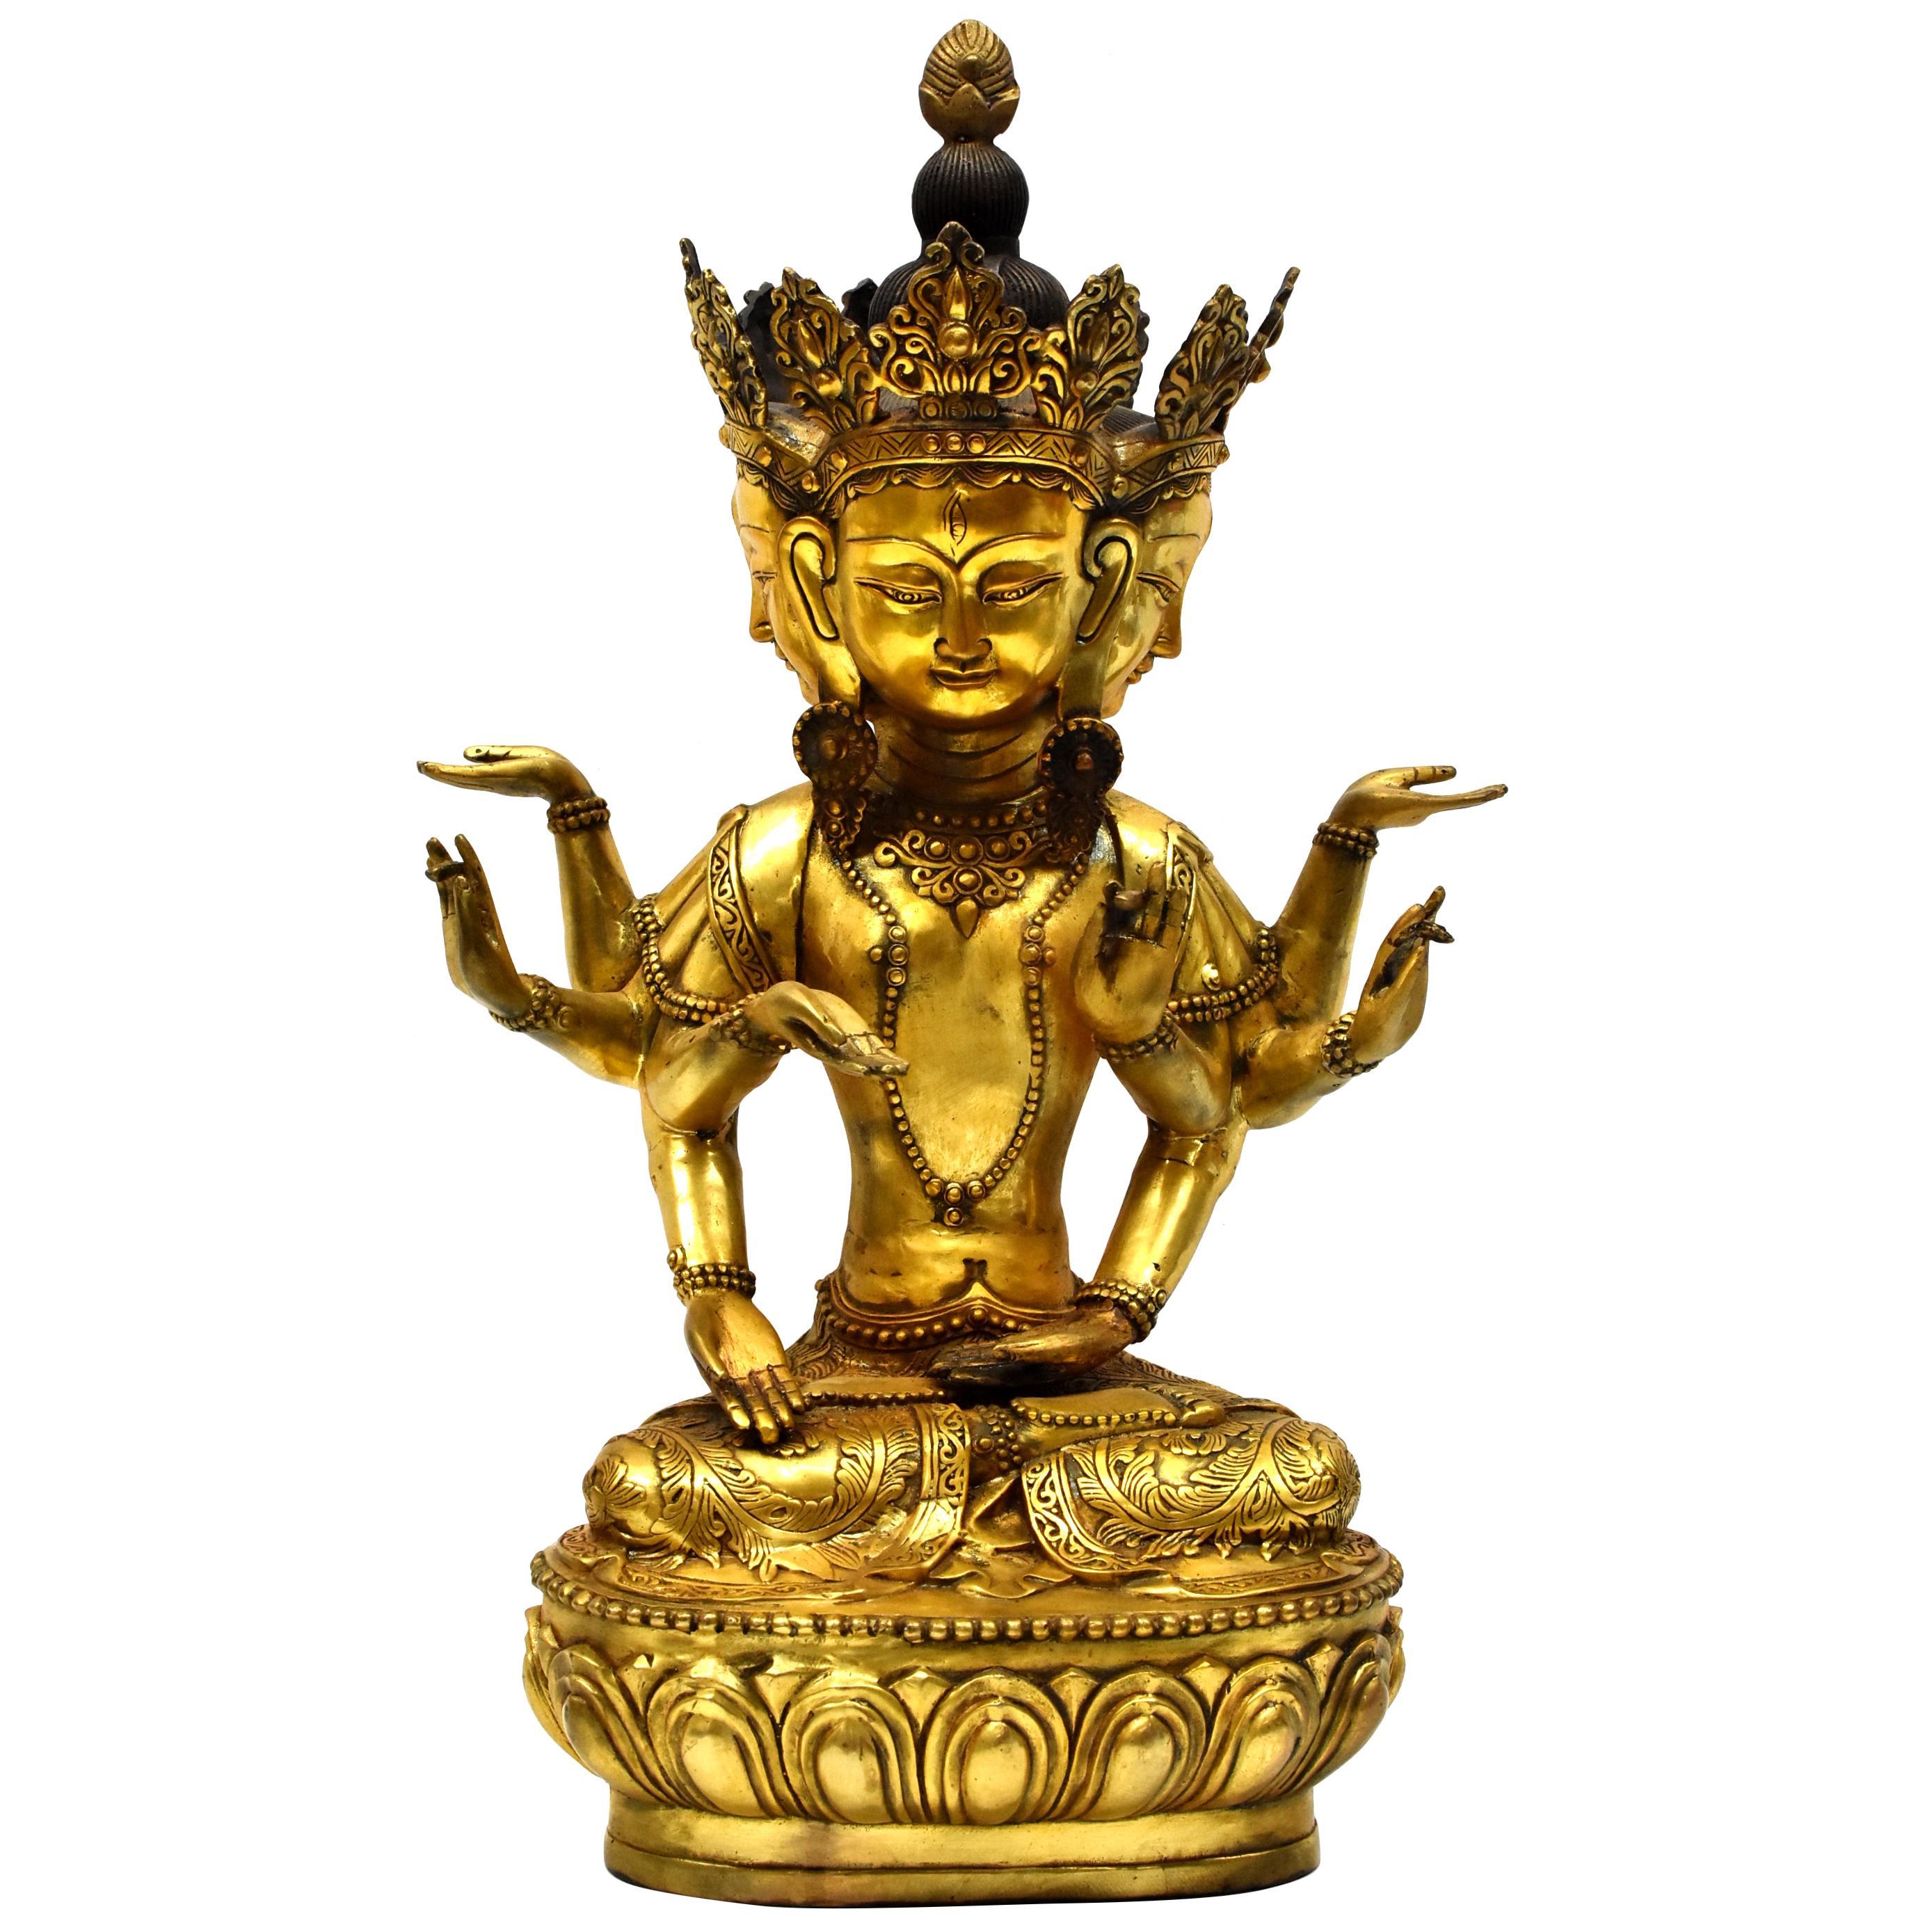 Large Gilded Tibetan Buddha Statue Vasundhara